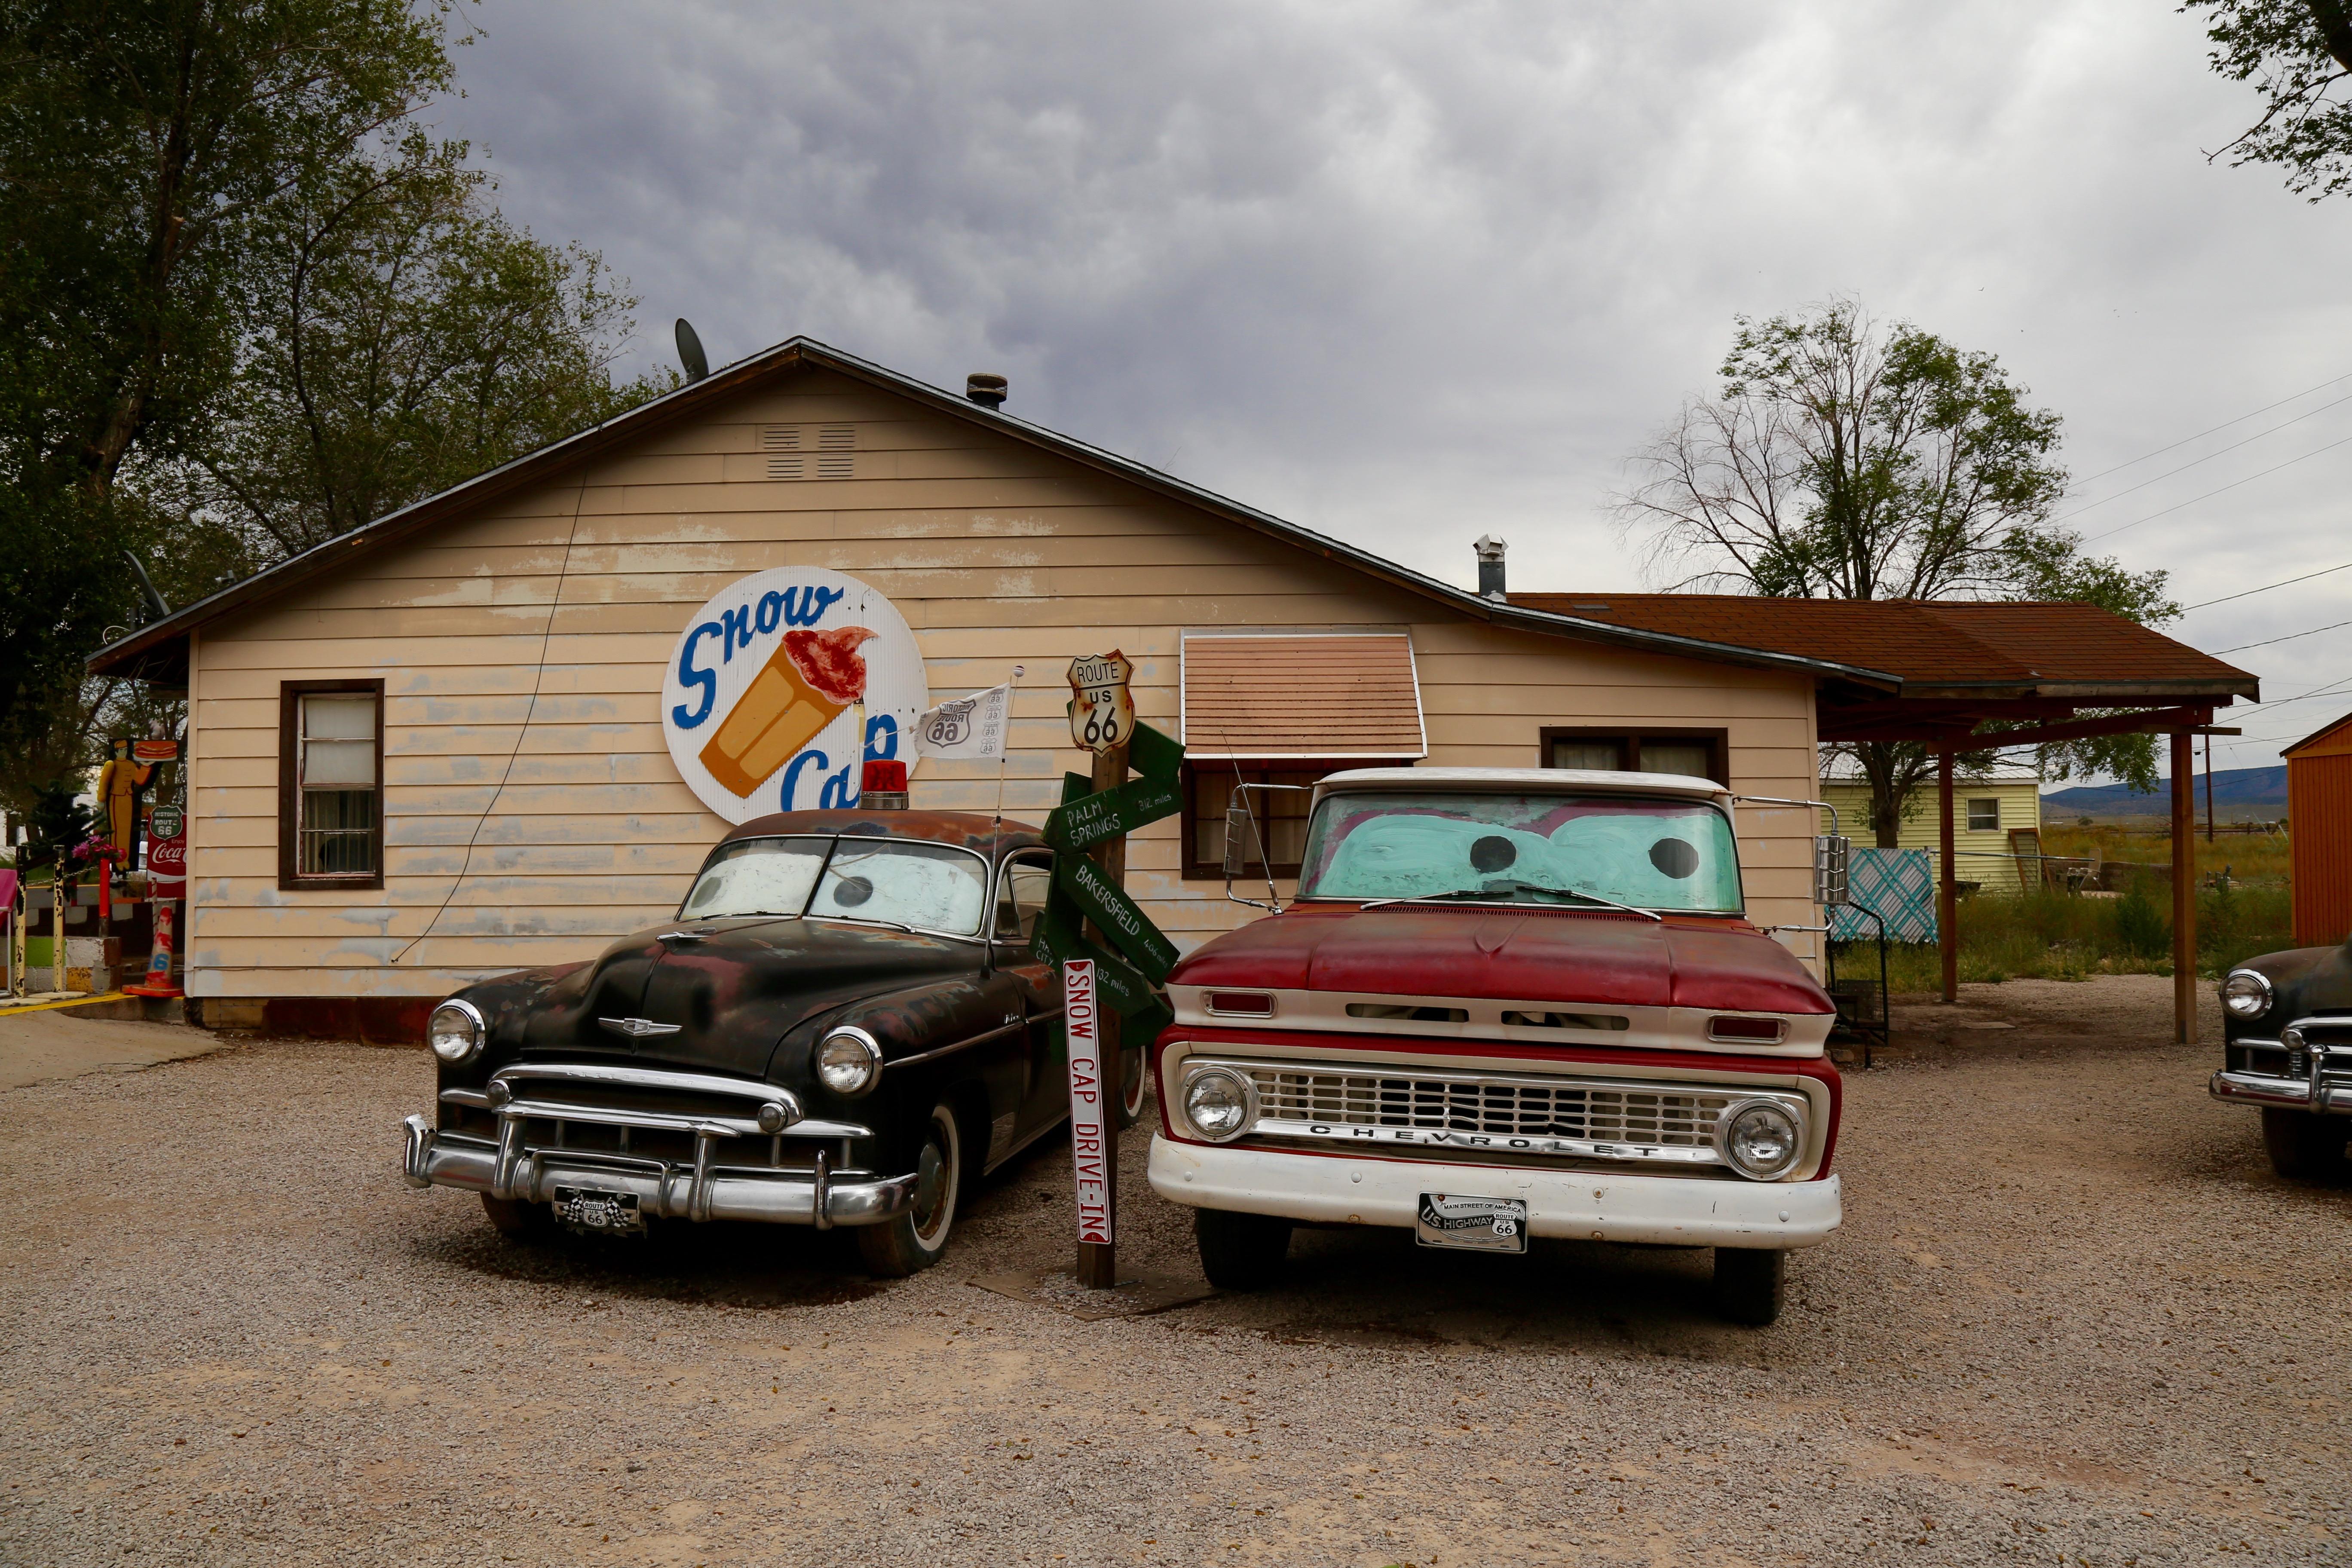 Cars Une Ode Animee A La Route 66 Road Trip Aux Usa